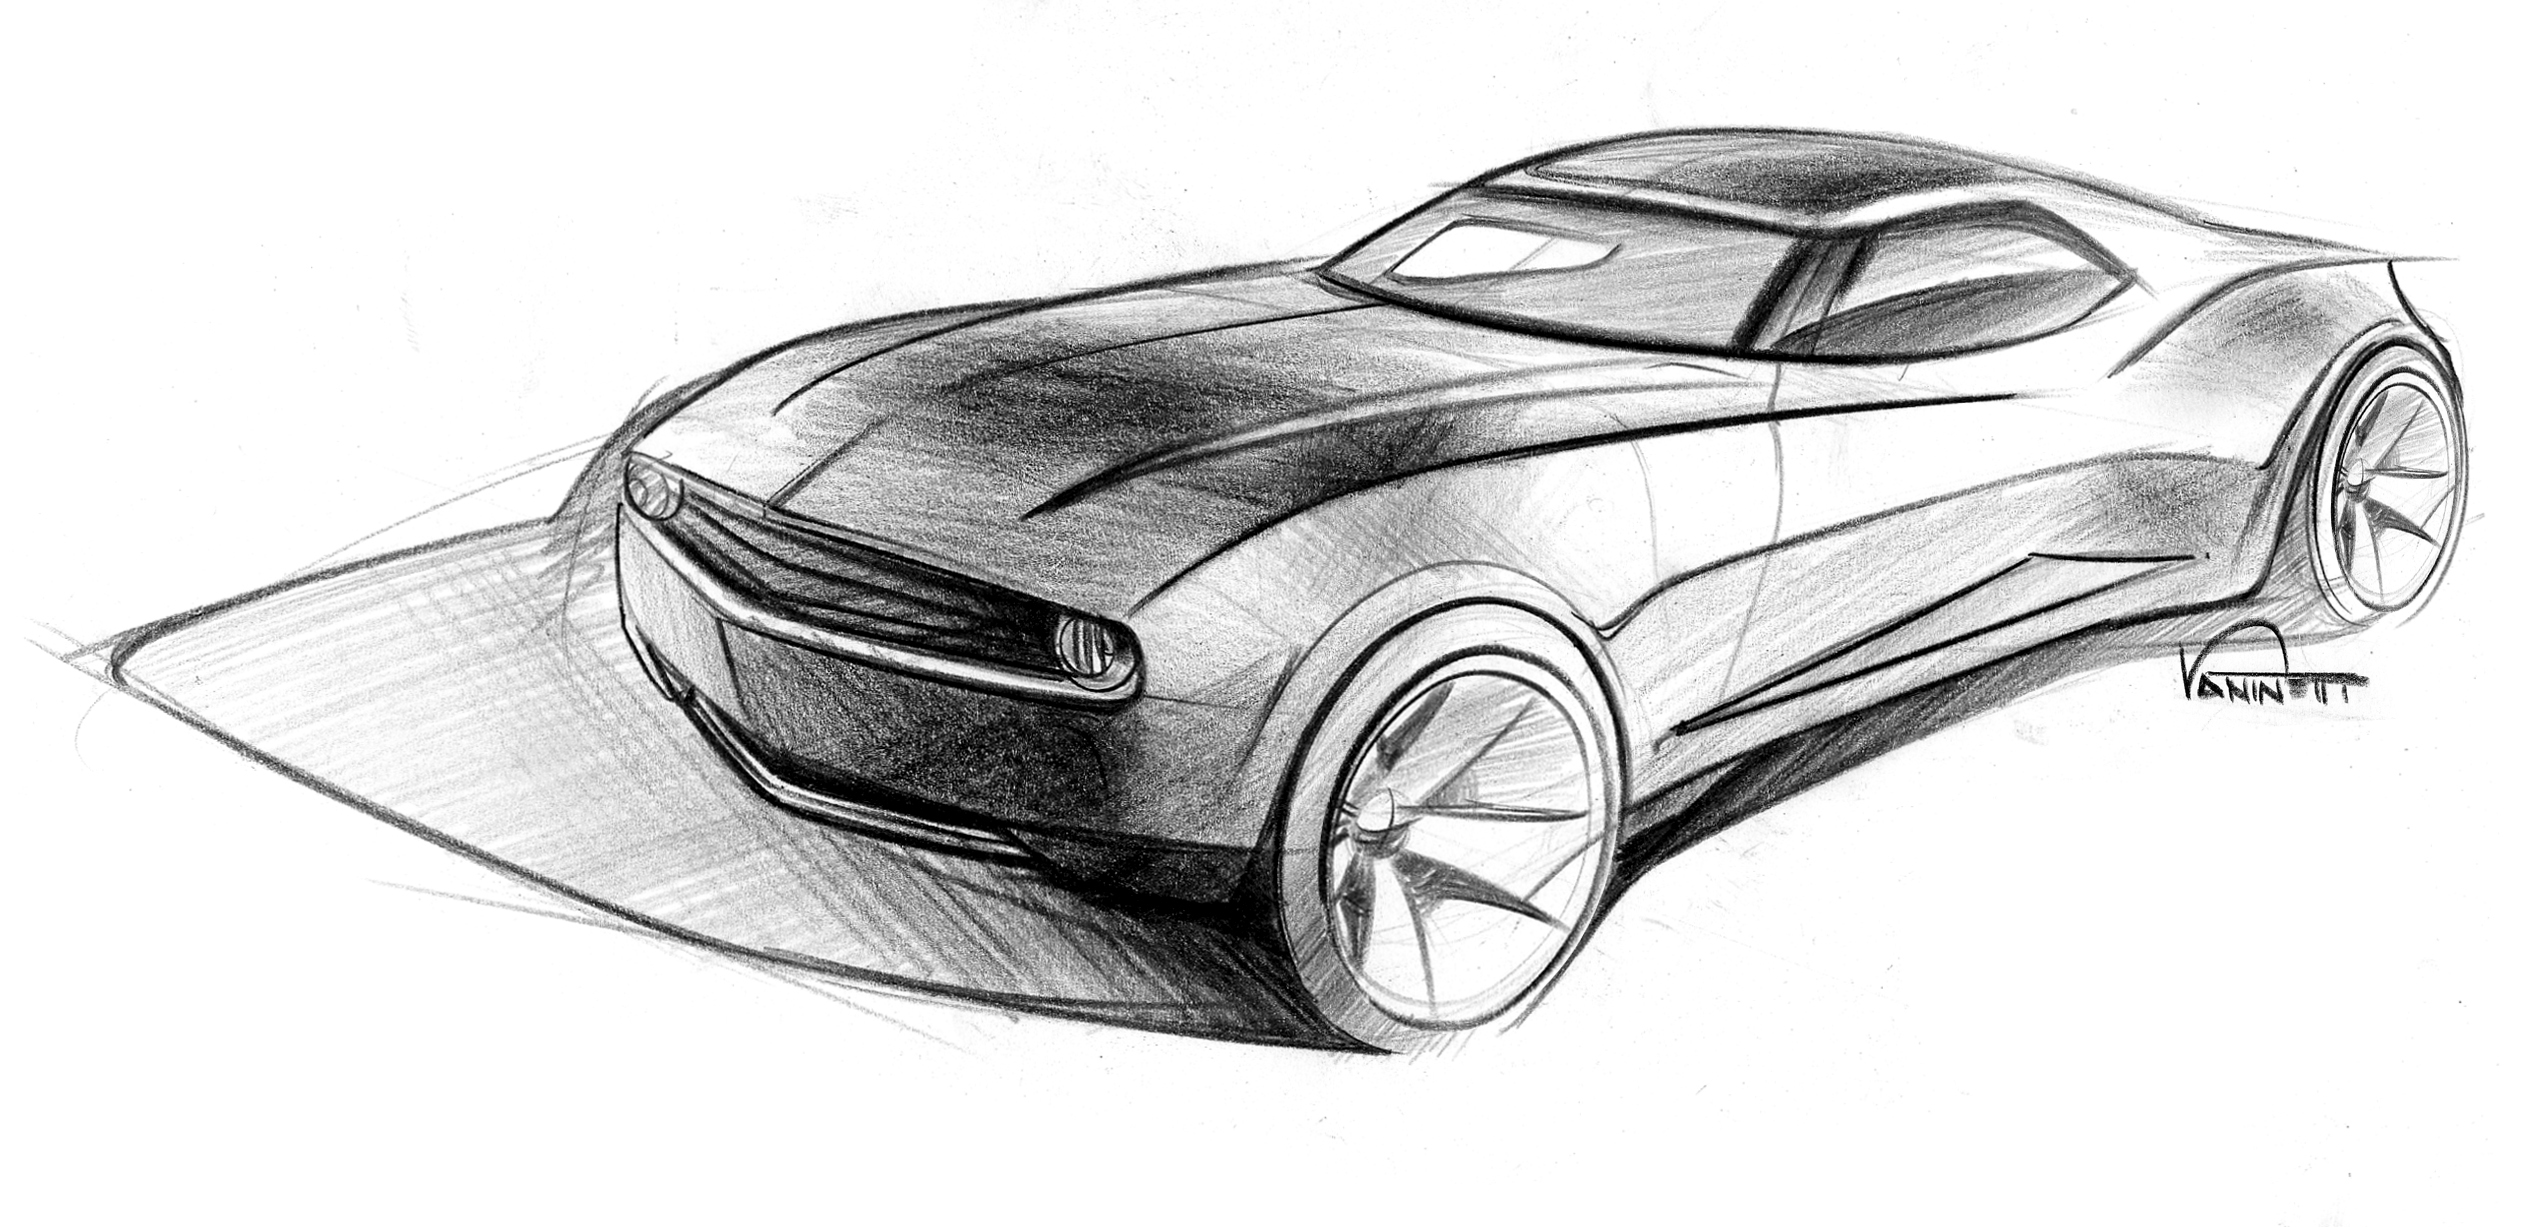 Cars Wallpaper: Simple Car Drawings Wallpapers HD with Wallpaper ...